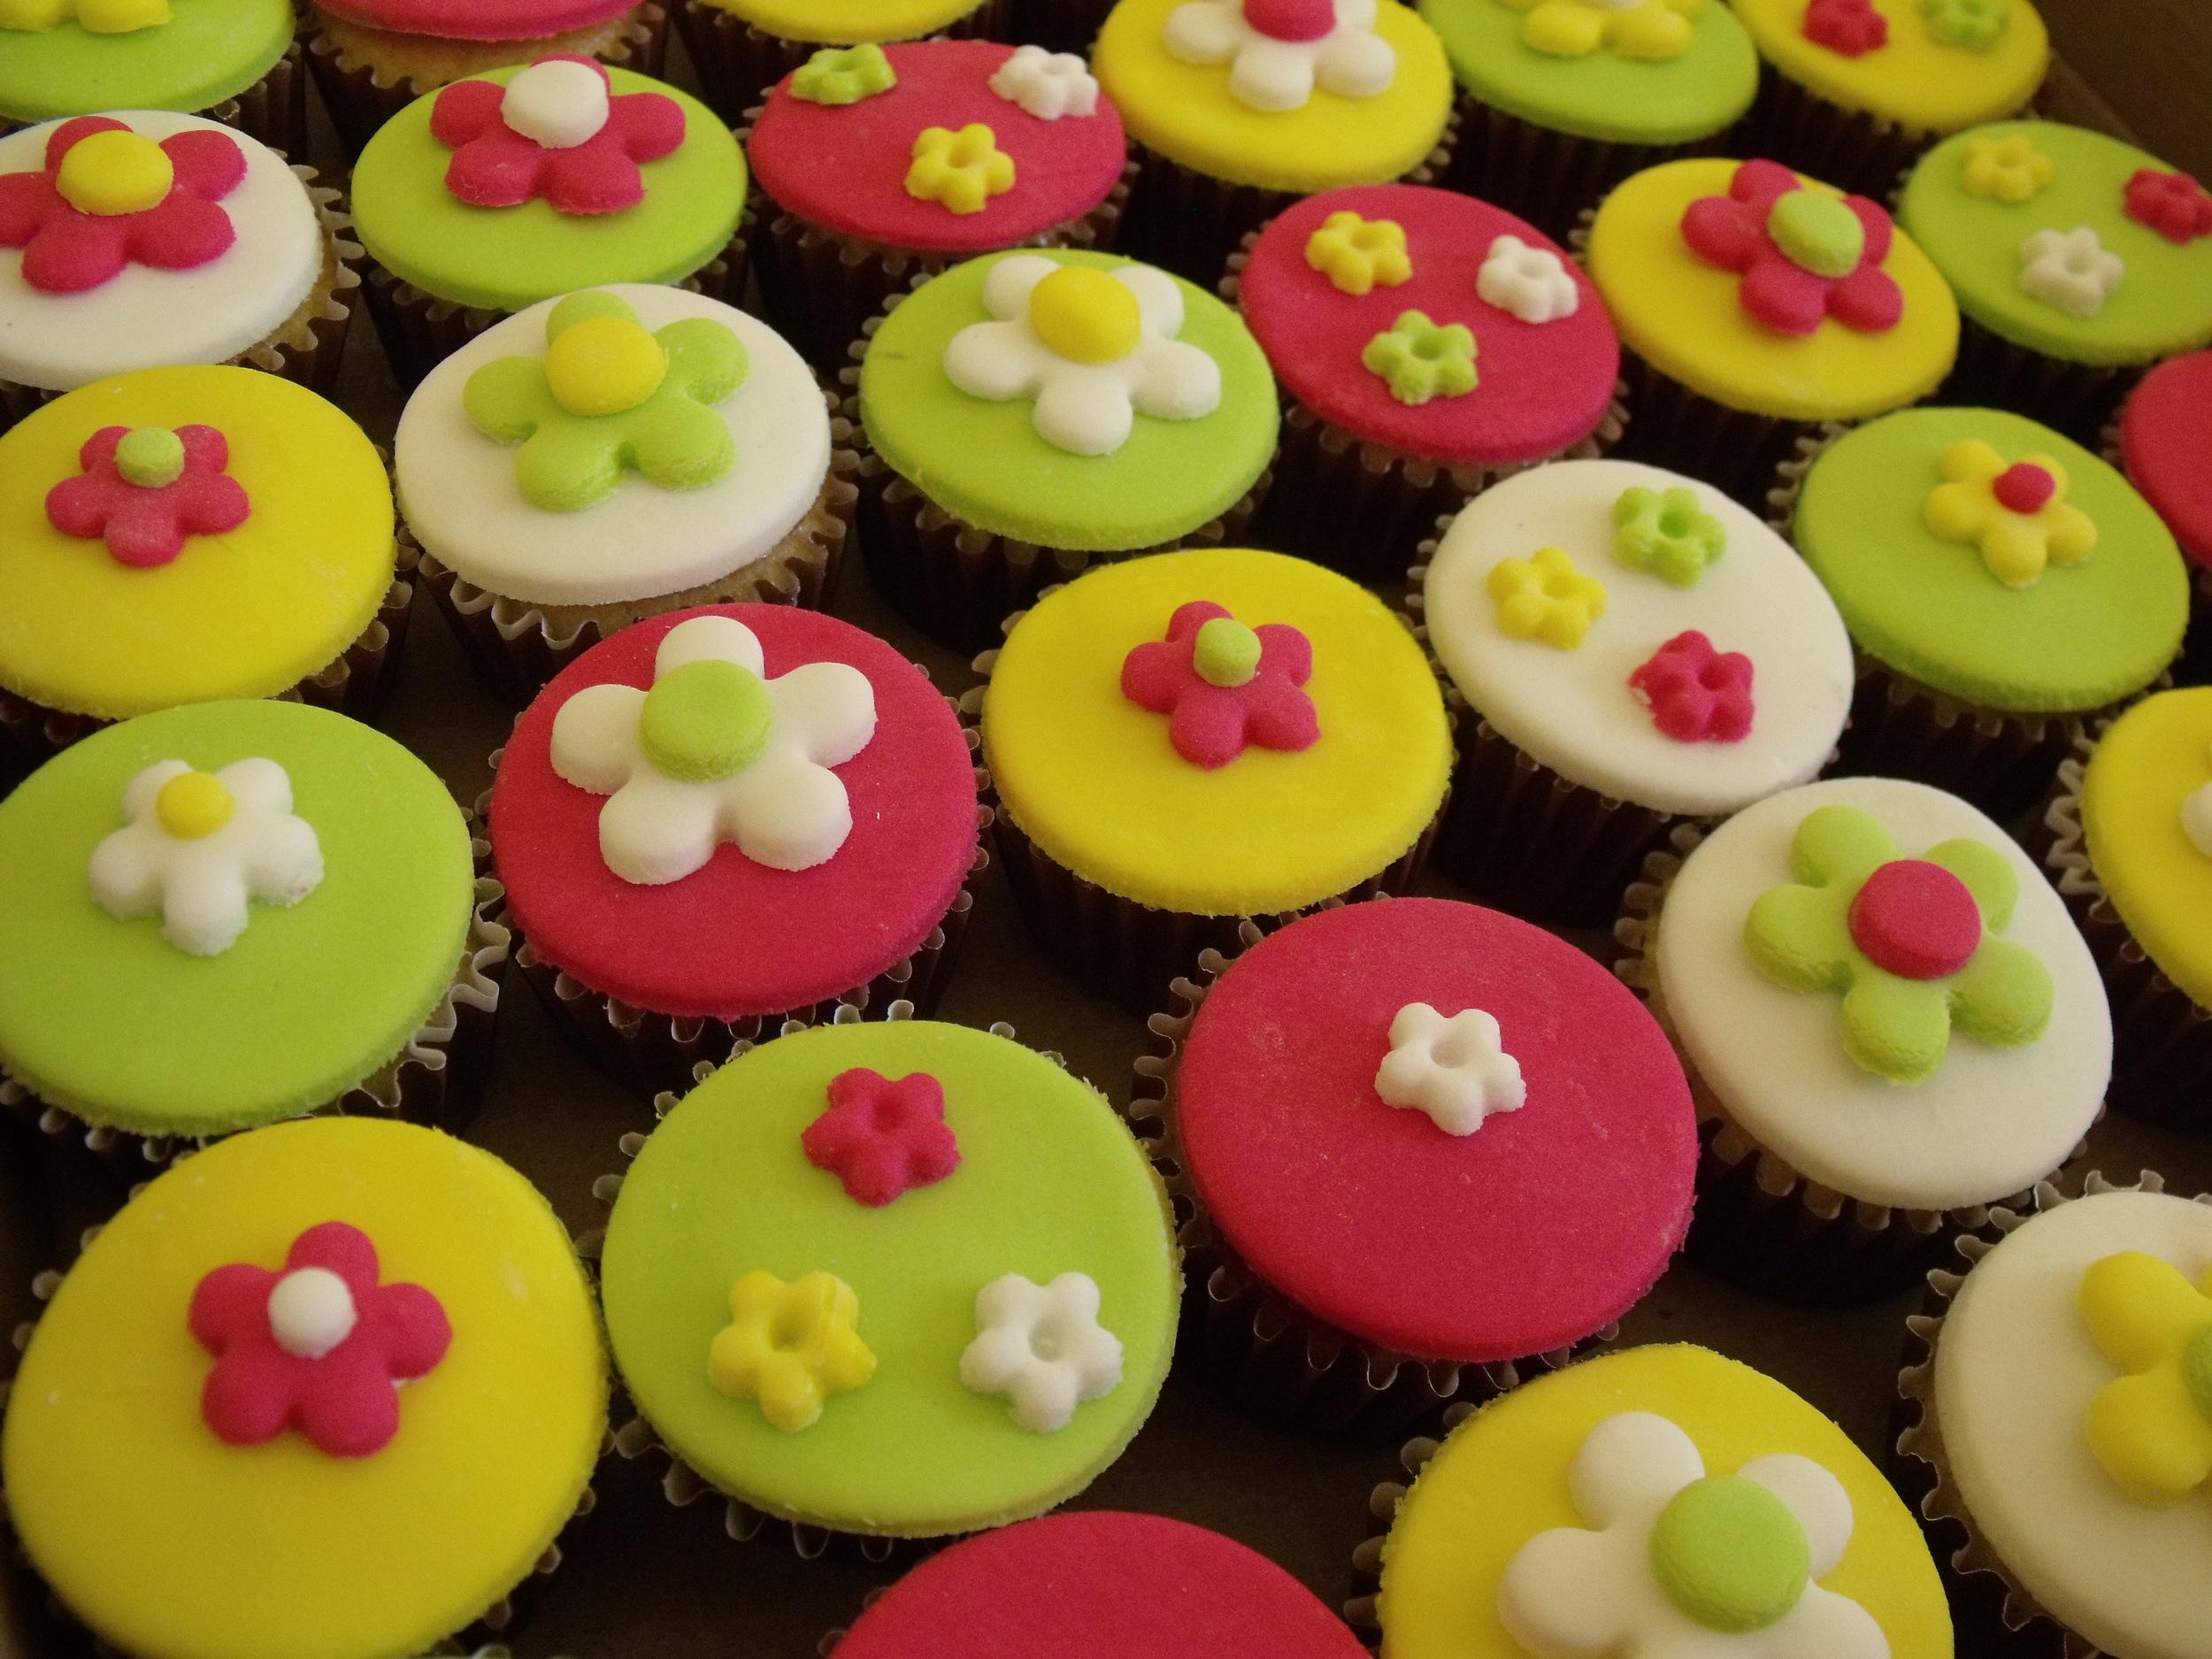 flores 22 BLOG FESTA.JPG